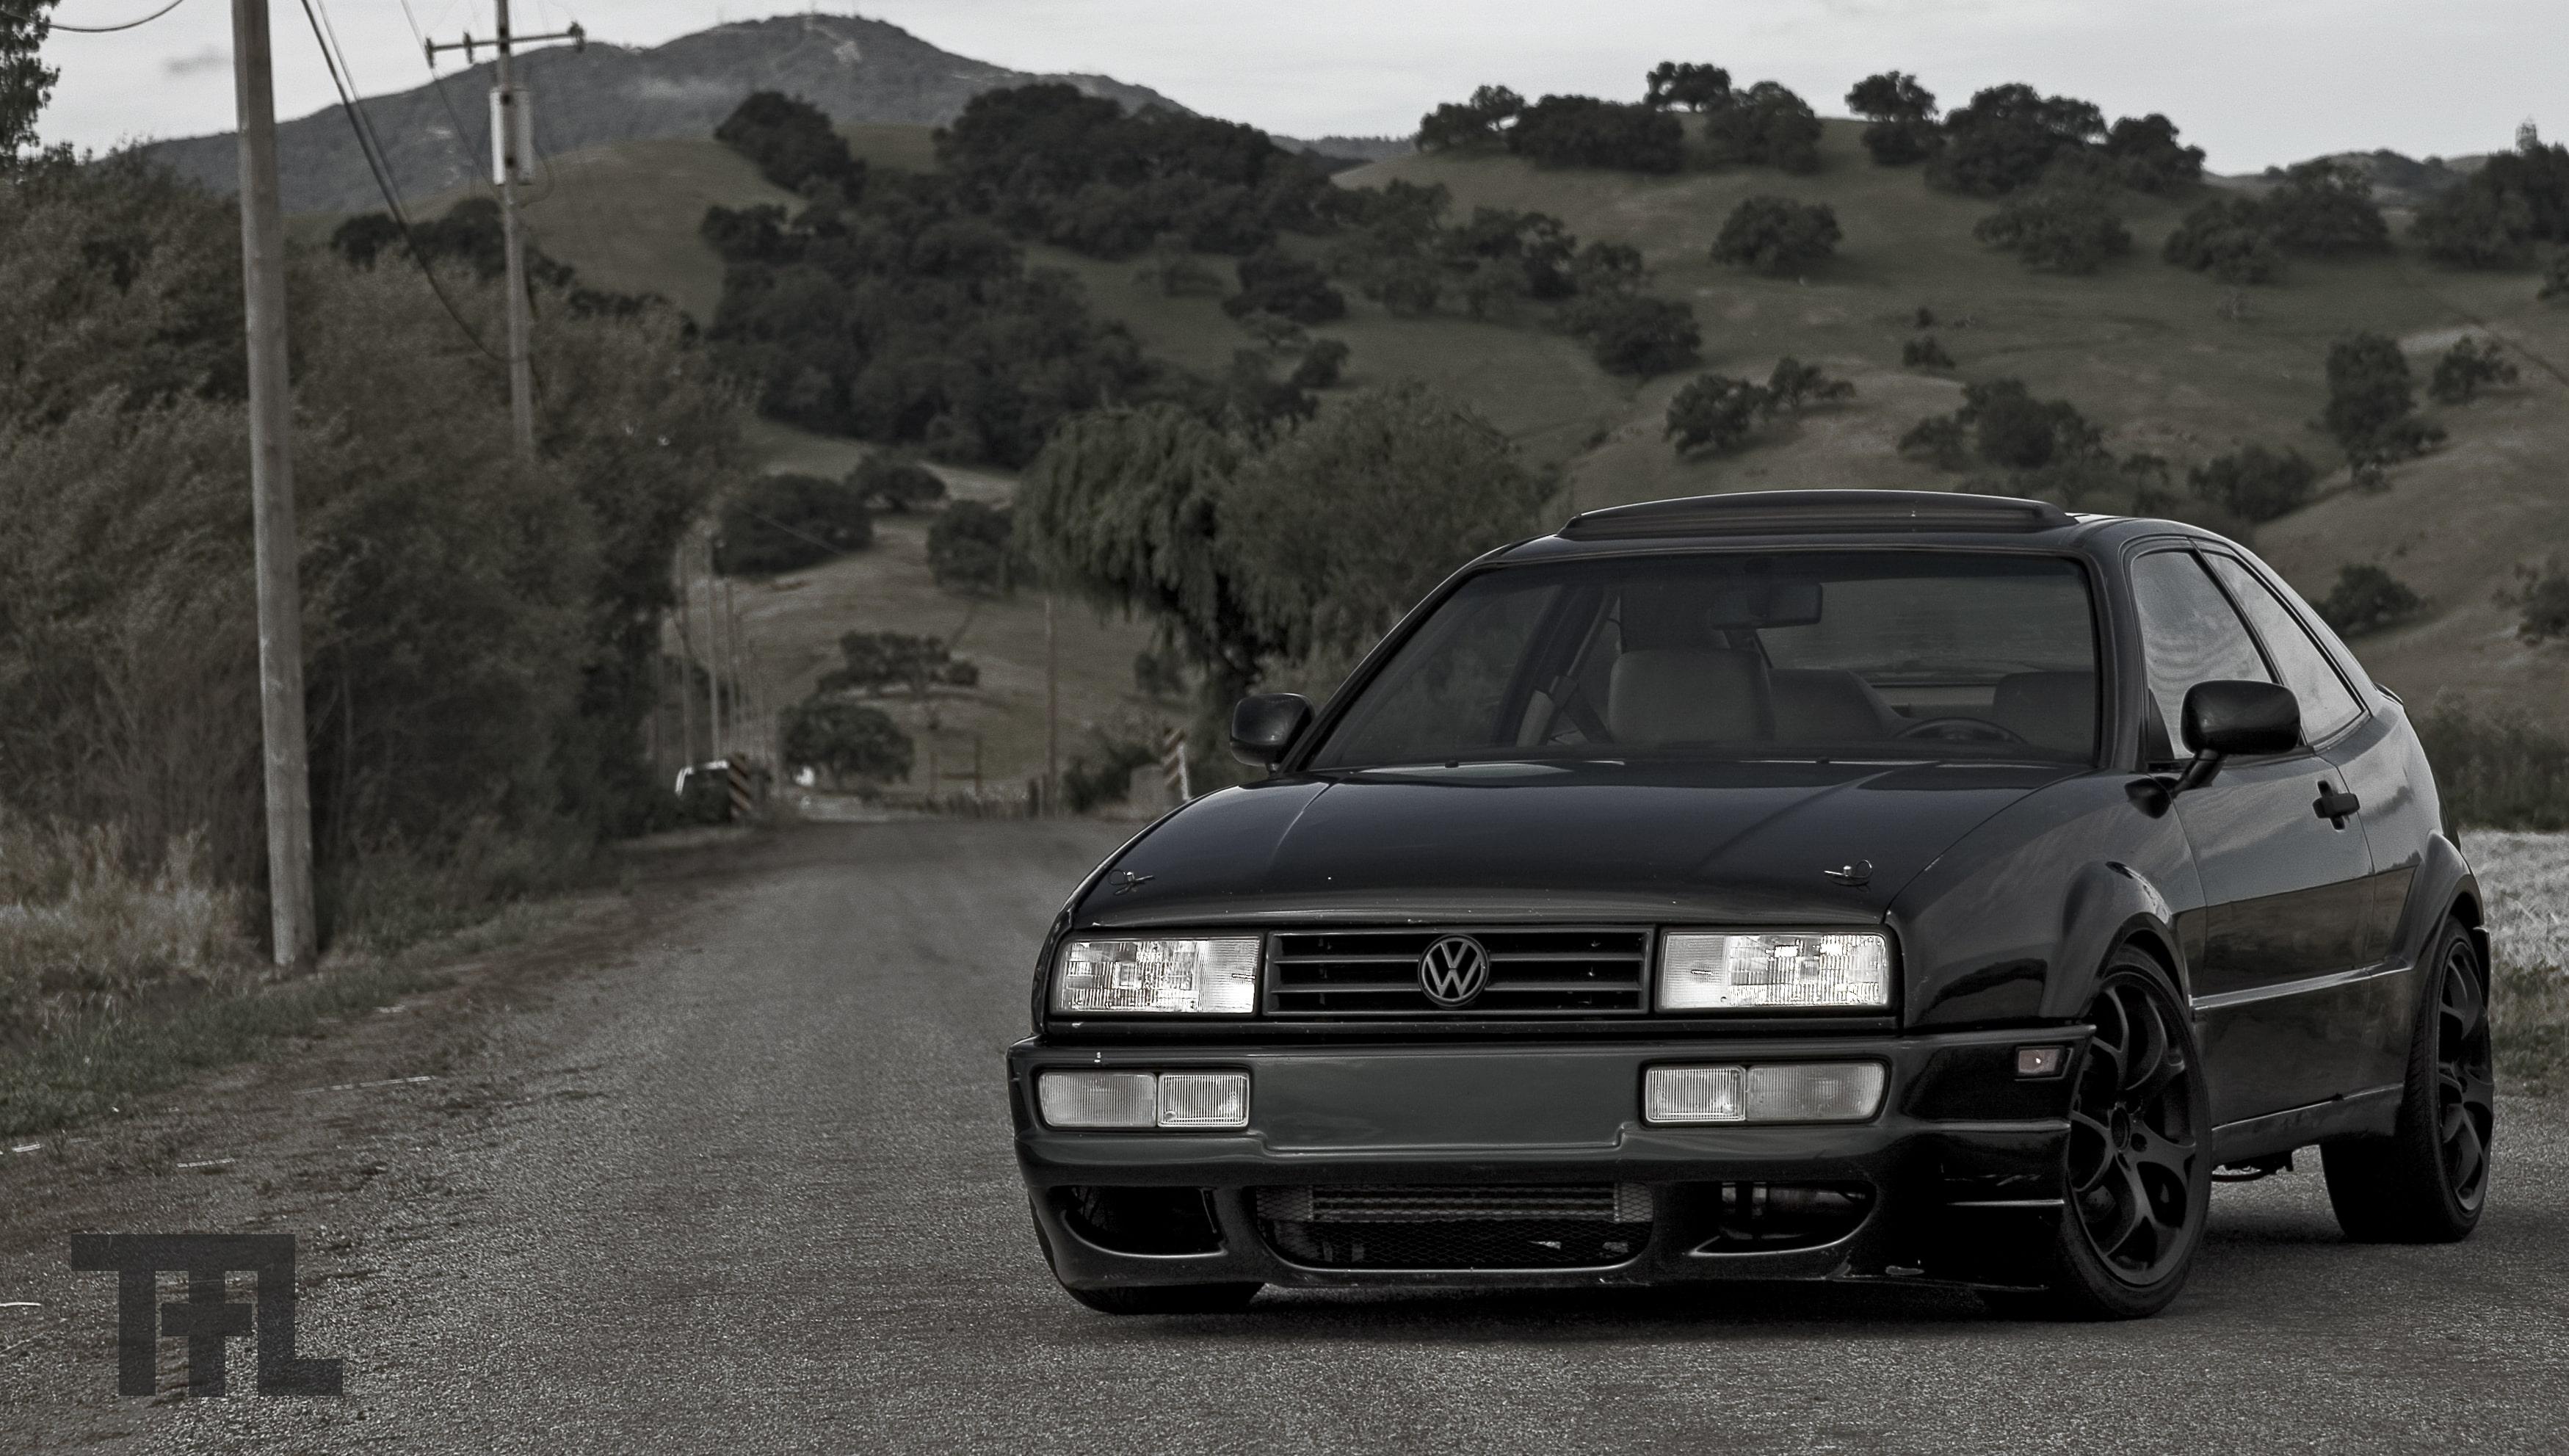 Volkswagen Corrado Wallpapers